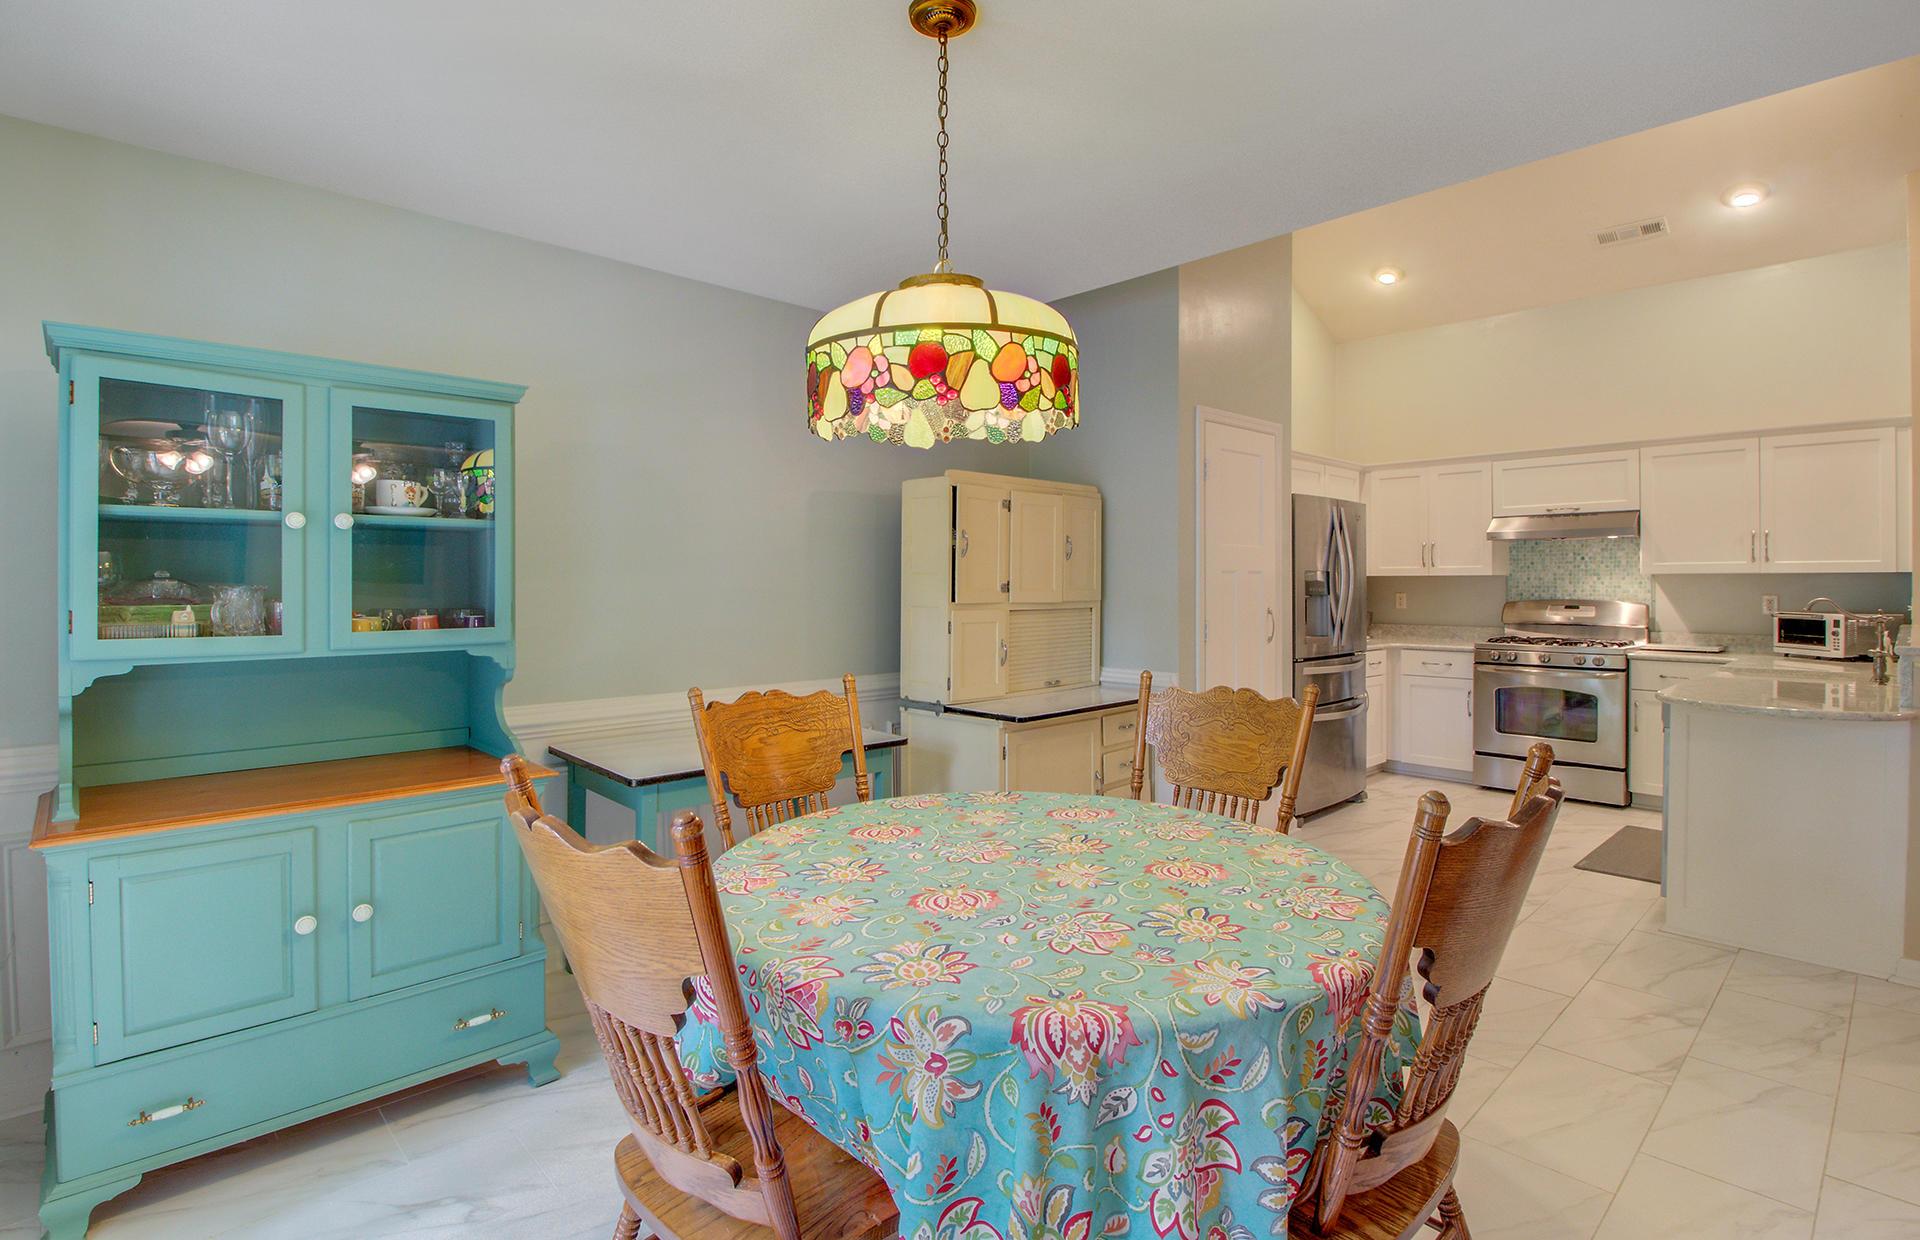 Park West Homes For Sale - 1500 Wellesley, Mount Pleasant, SC - 31